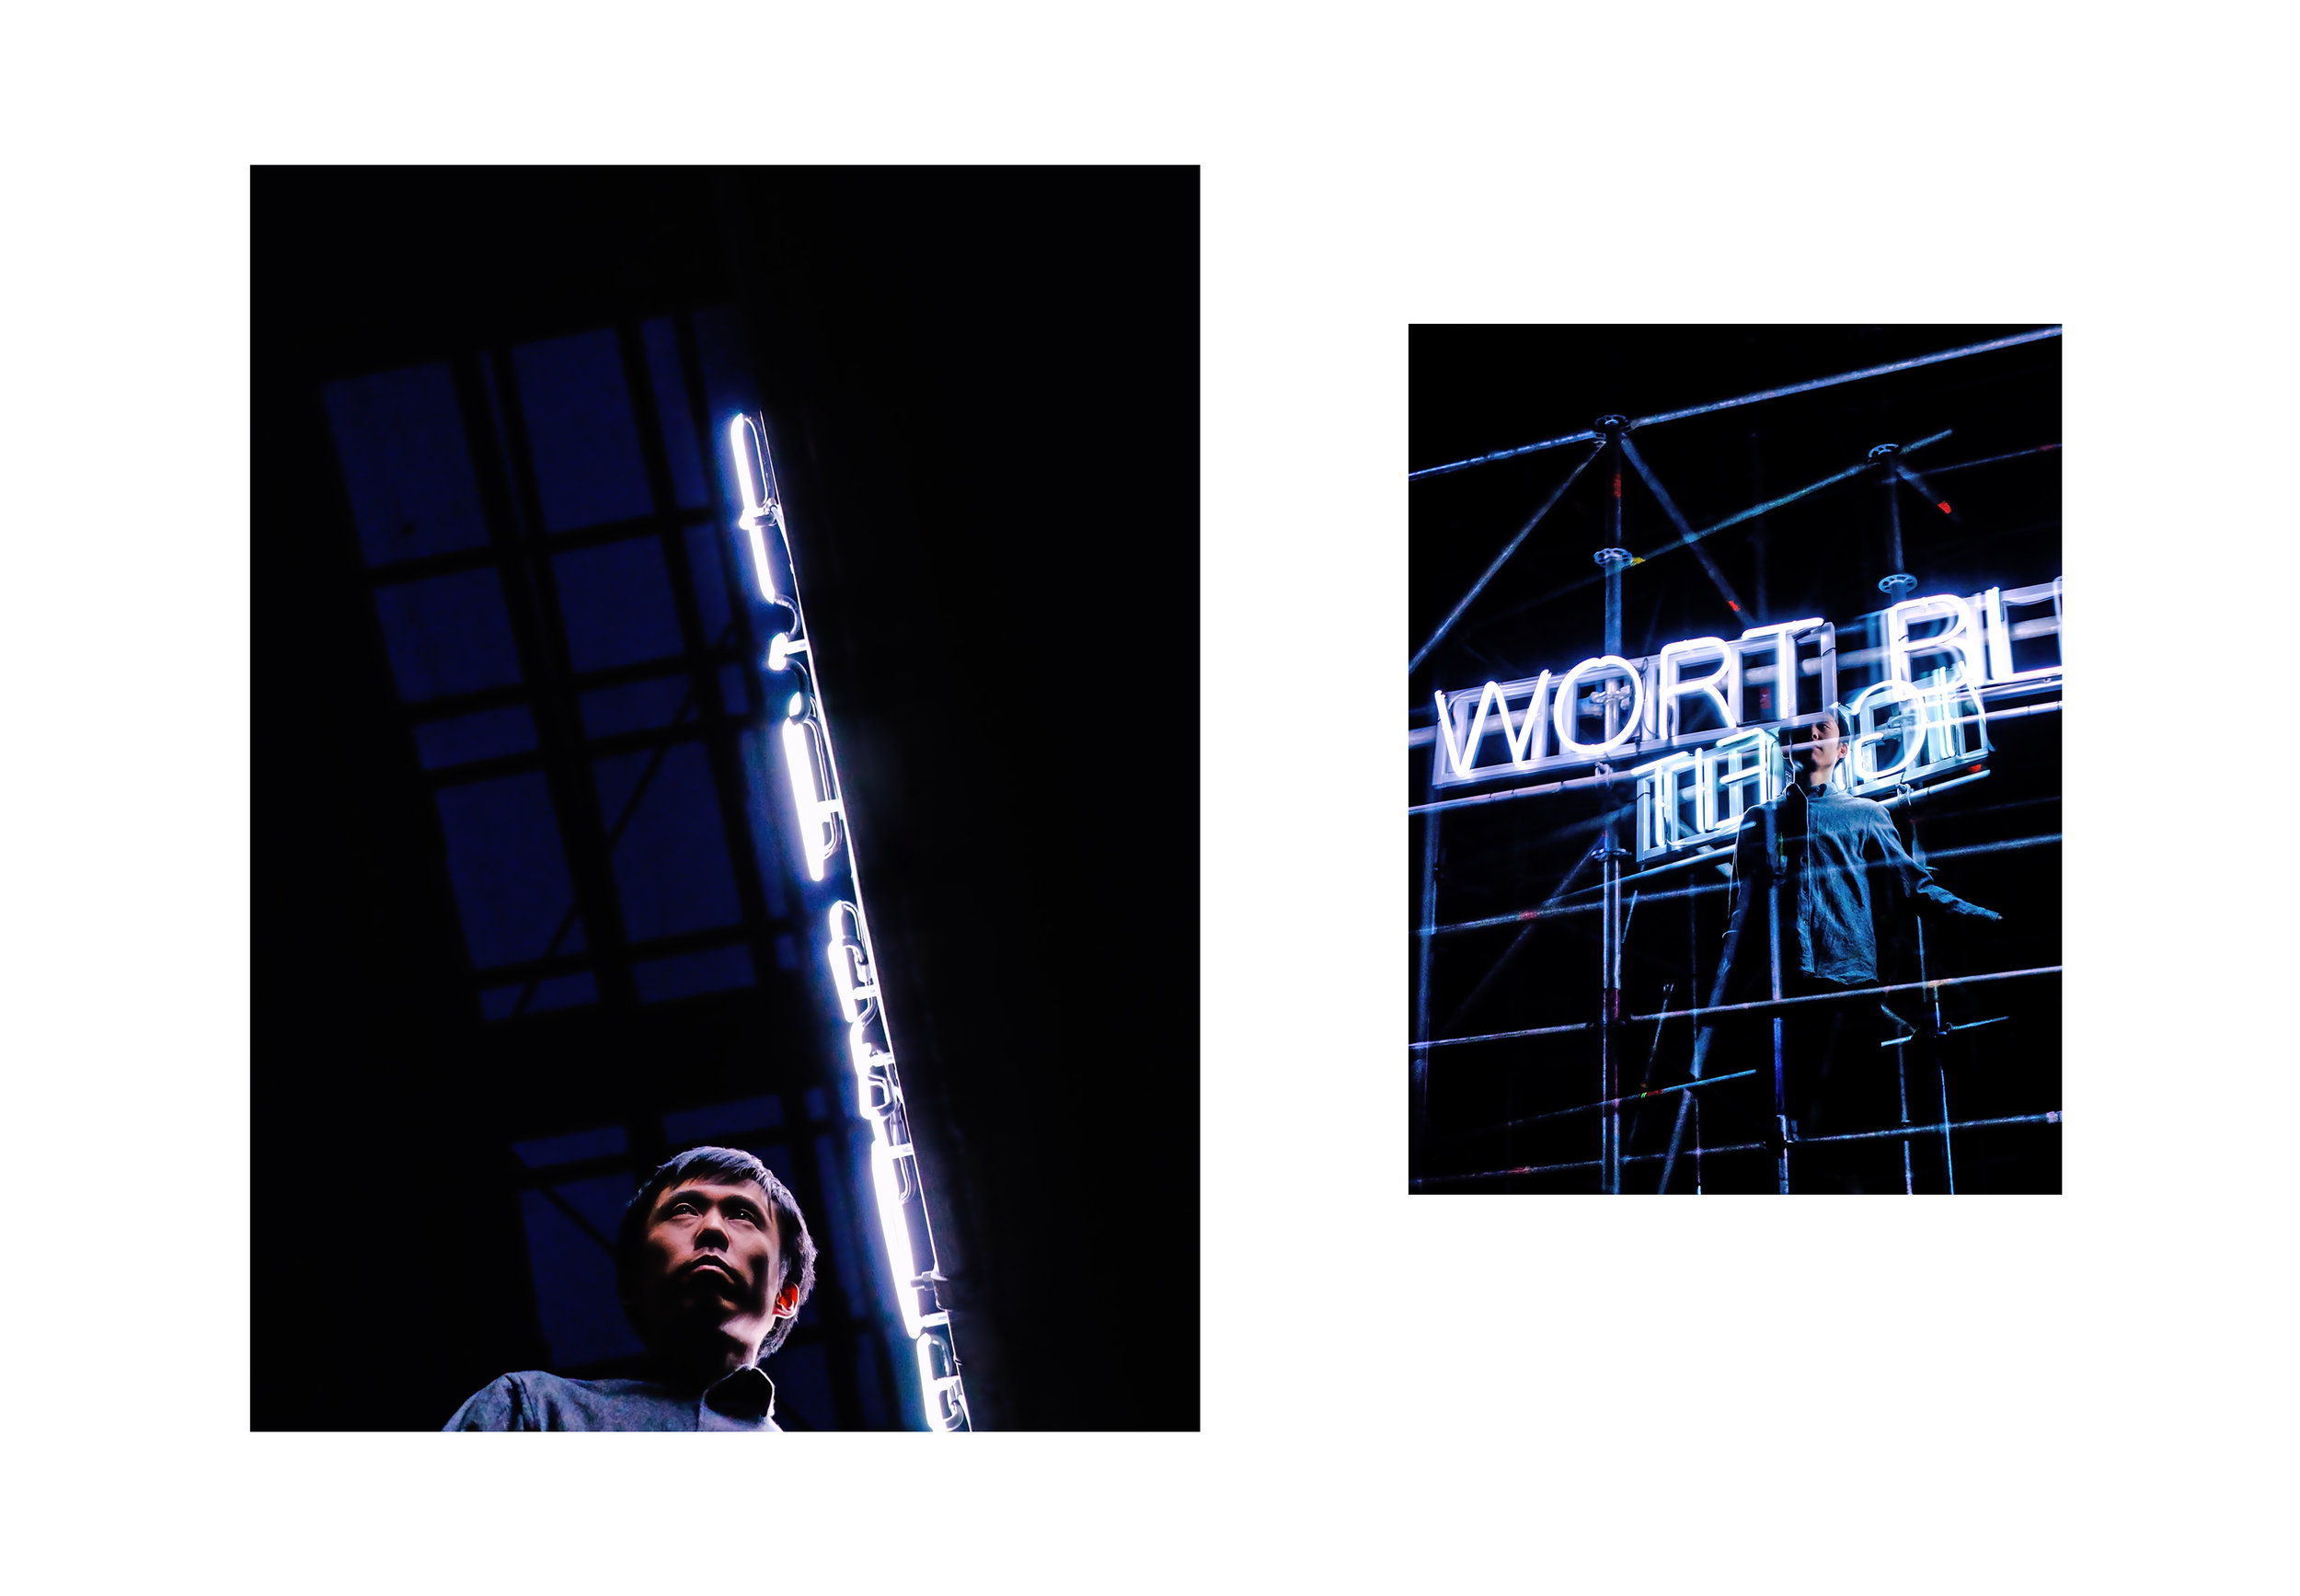 Riku-ikegaya-Architect-Artist-Portrait-Berlin-Matthew-Coleman-Photography-2.jpg